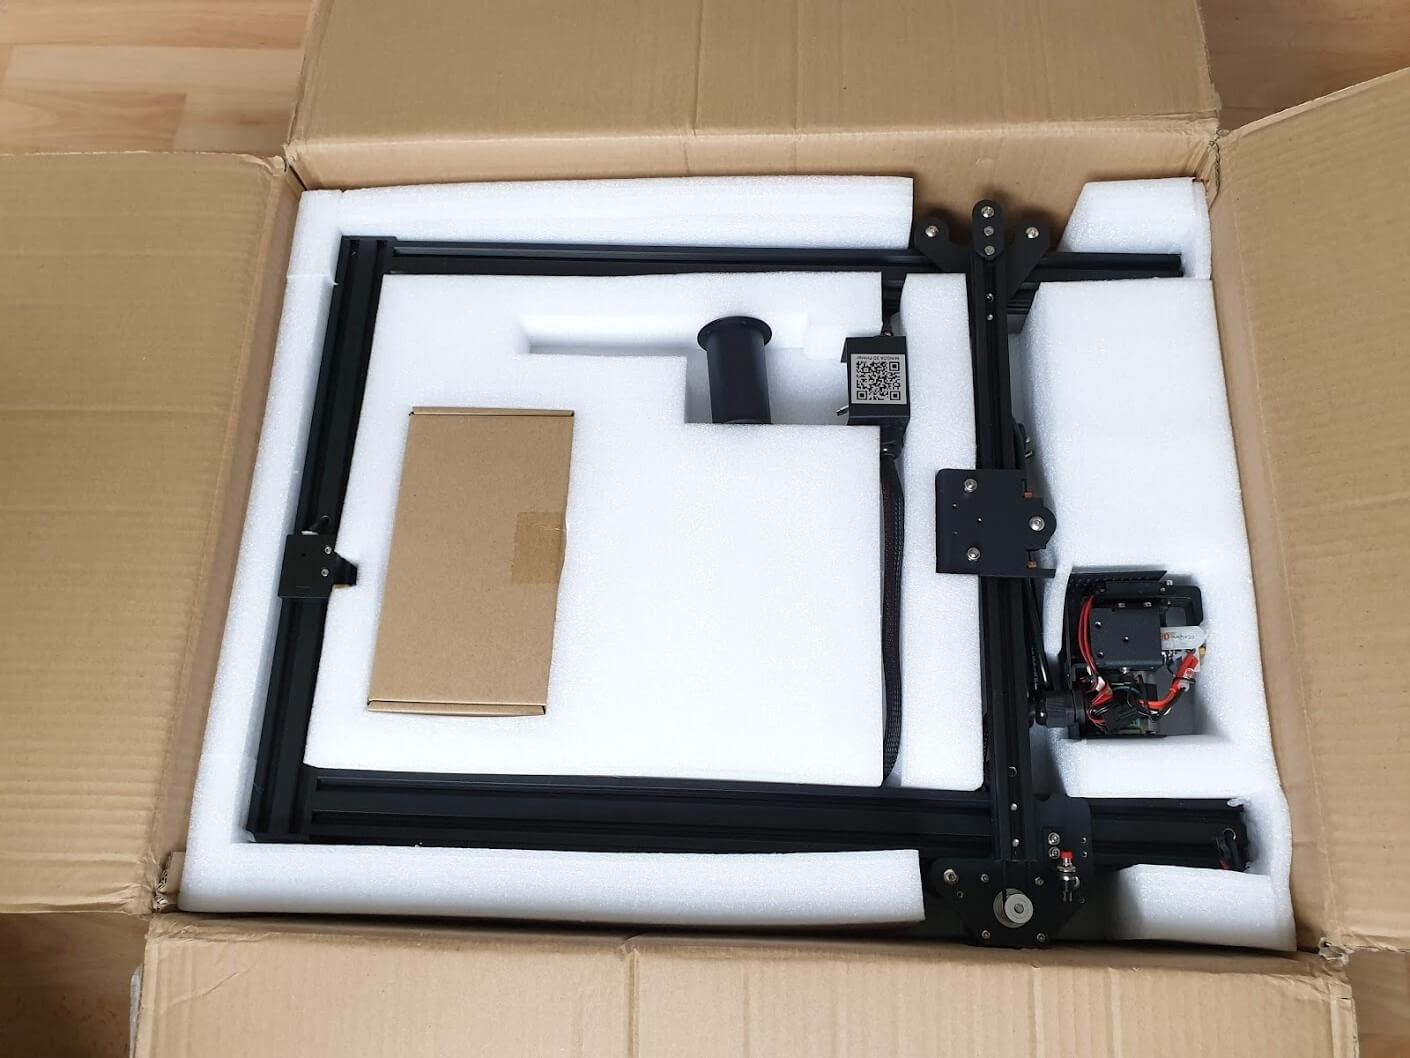 Mingda-D3-Pro-Review-Packaging-3